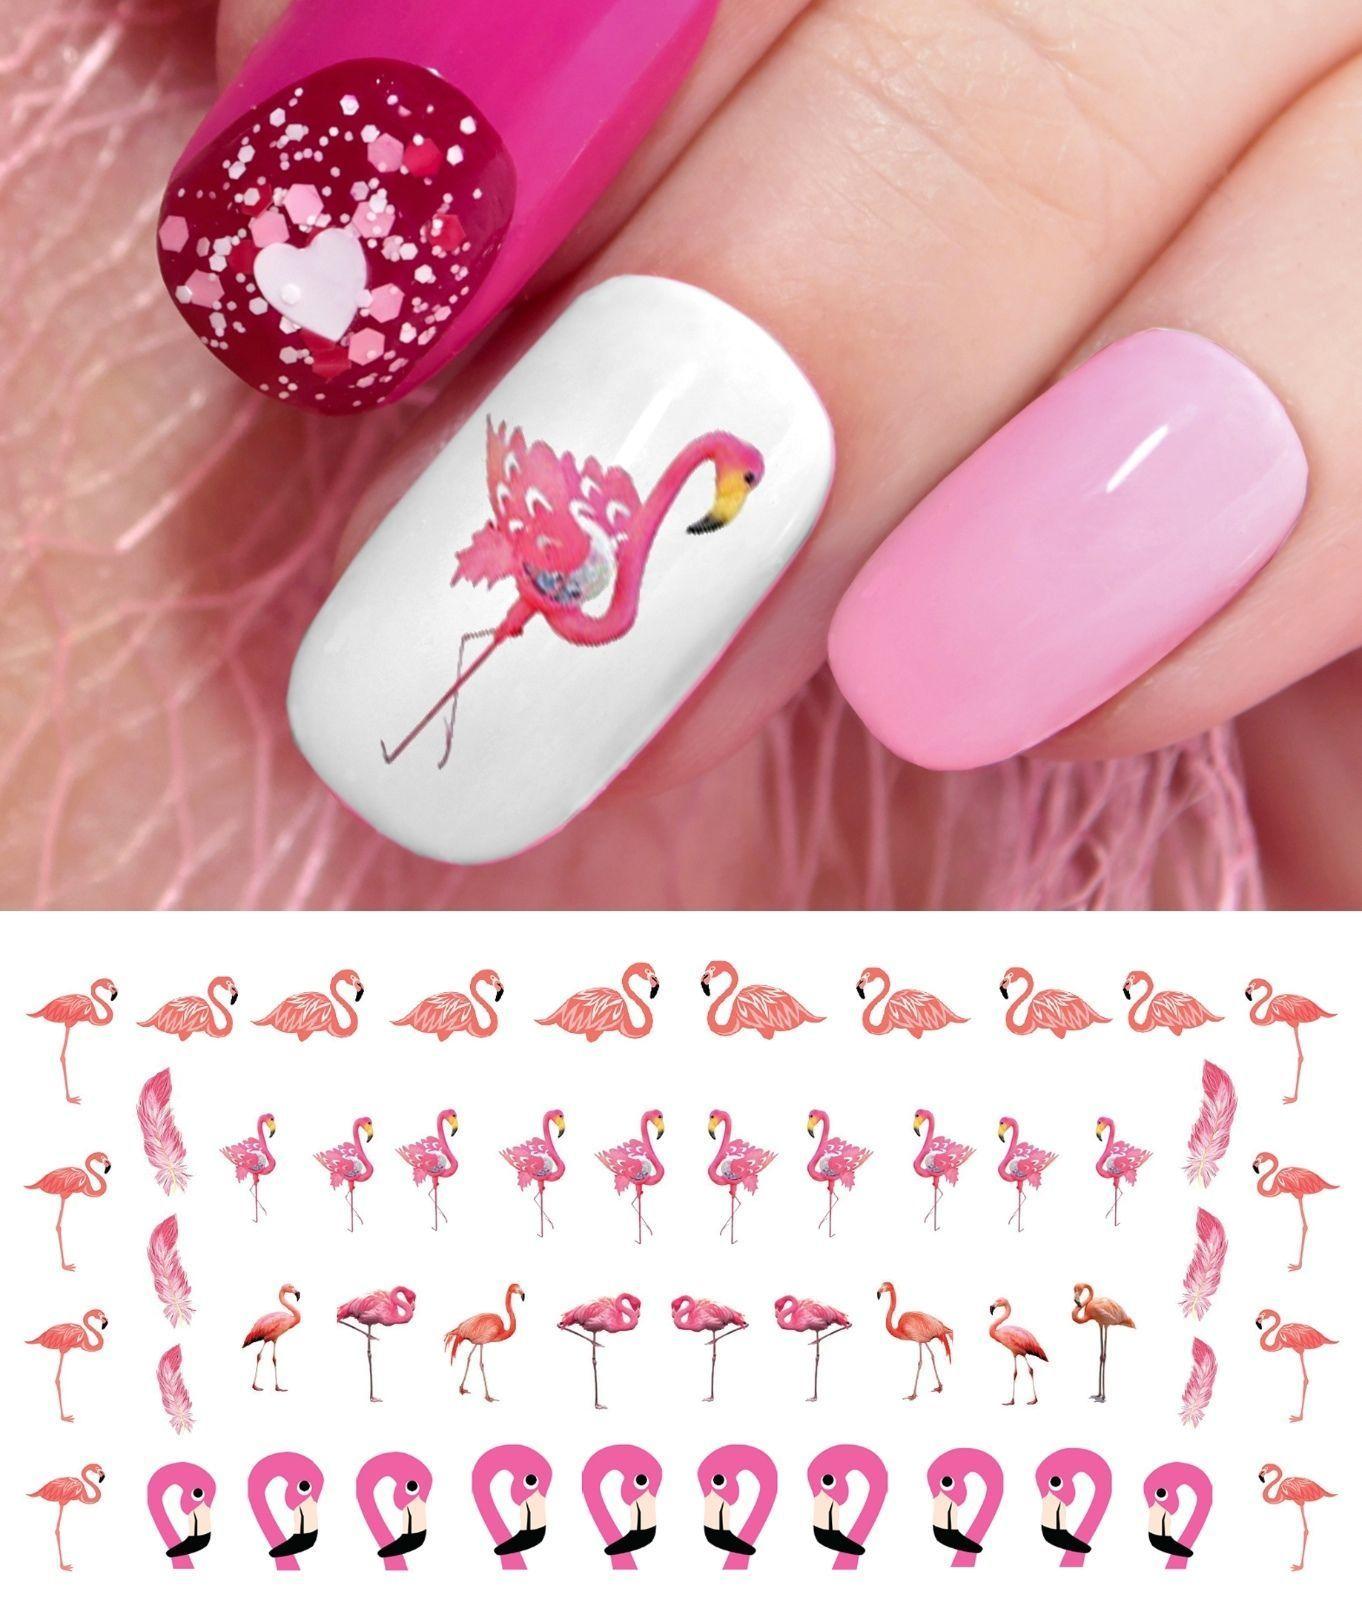 Flamingo Nail Art Waterslide Decals - Salon Quality!   Nail Art ...